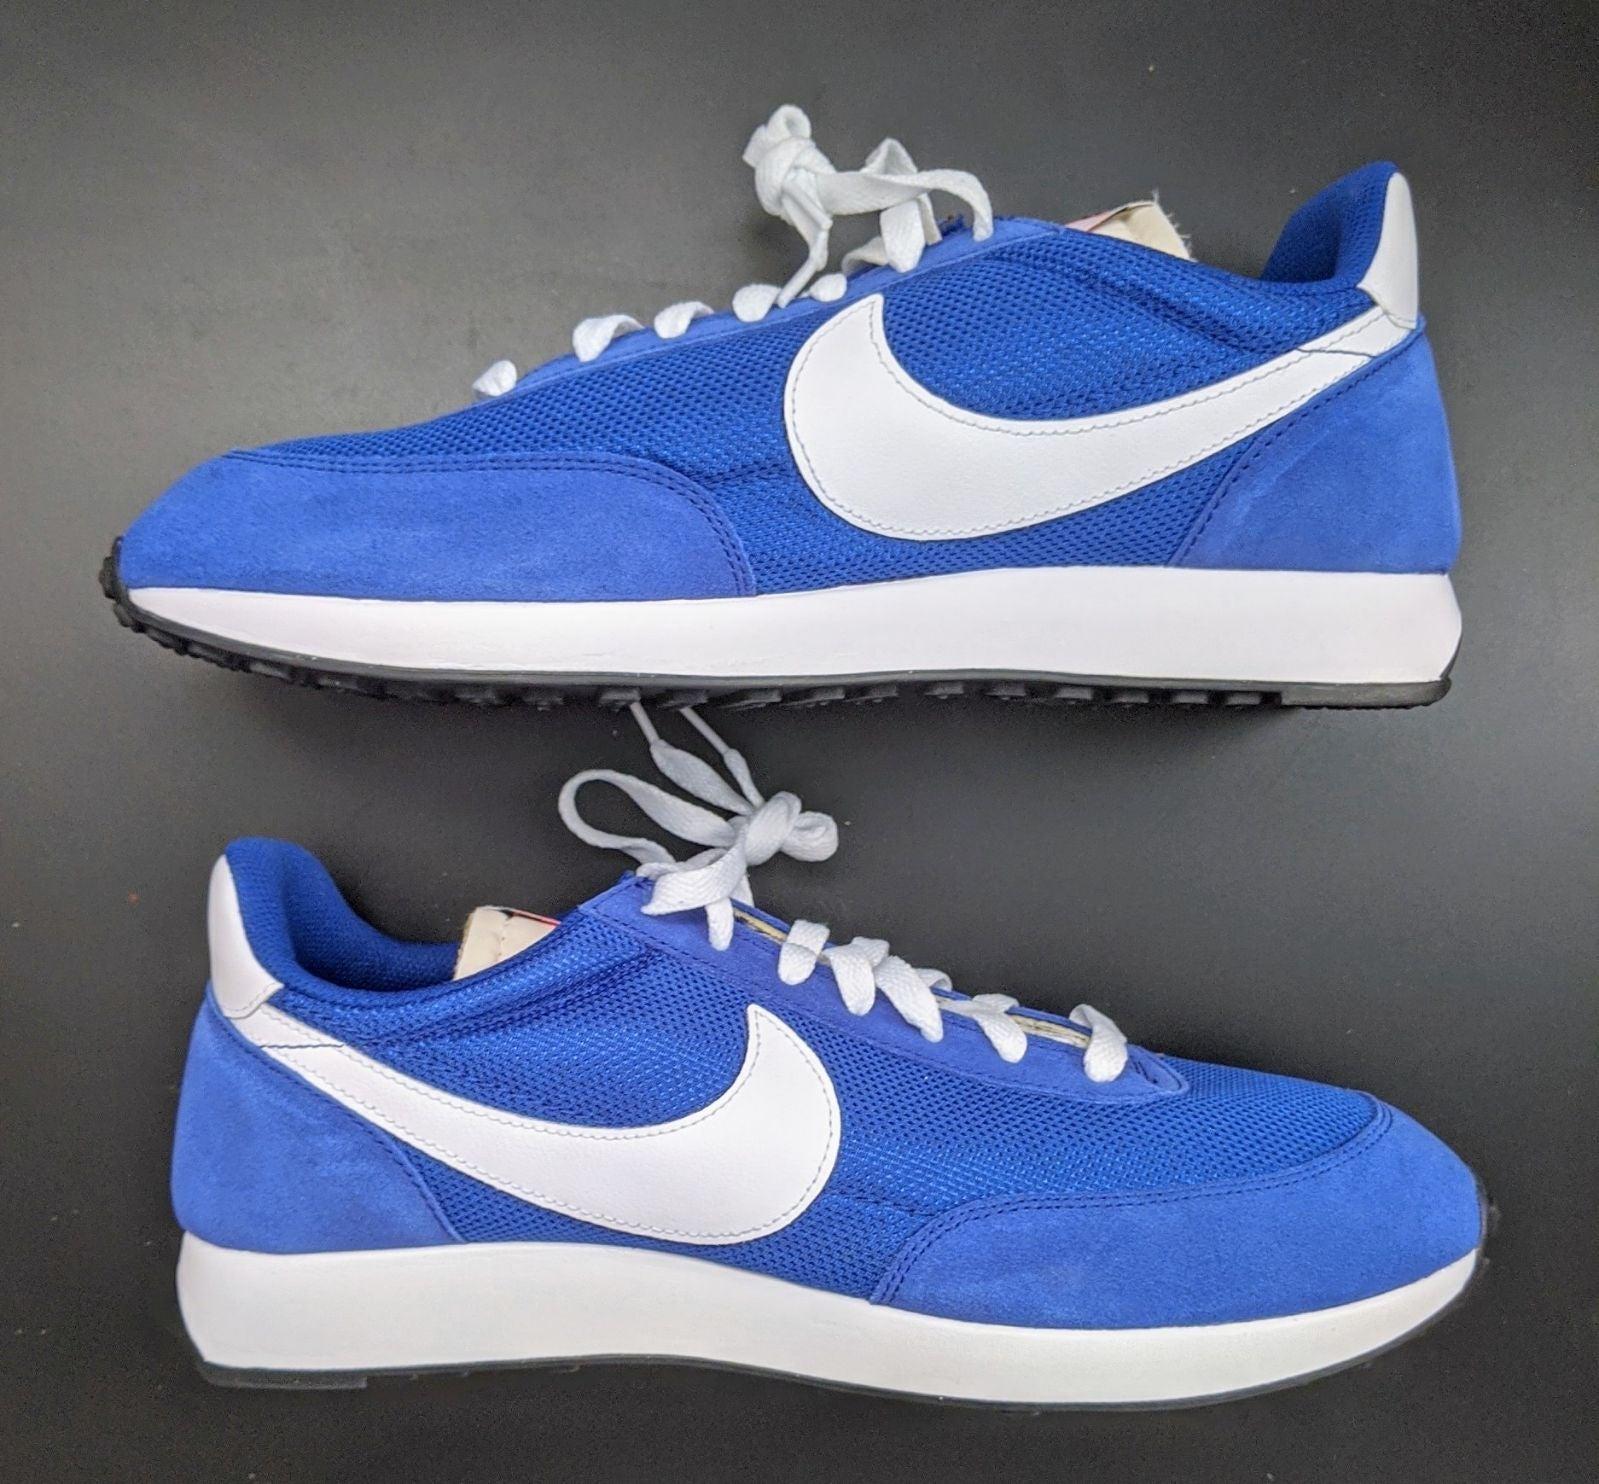 Nike Air Tailwind 79 Indigo Blue Size 13